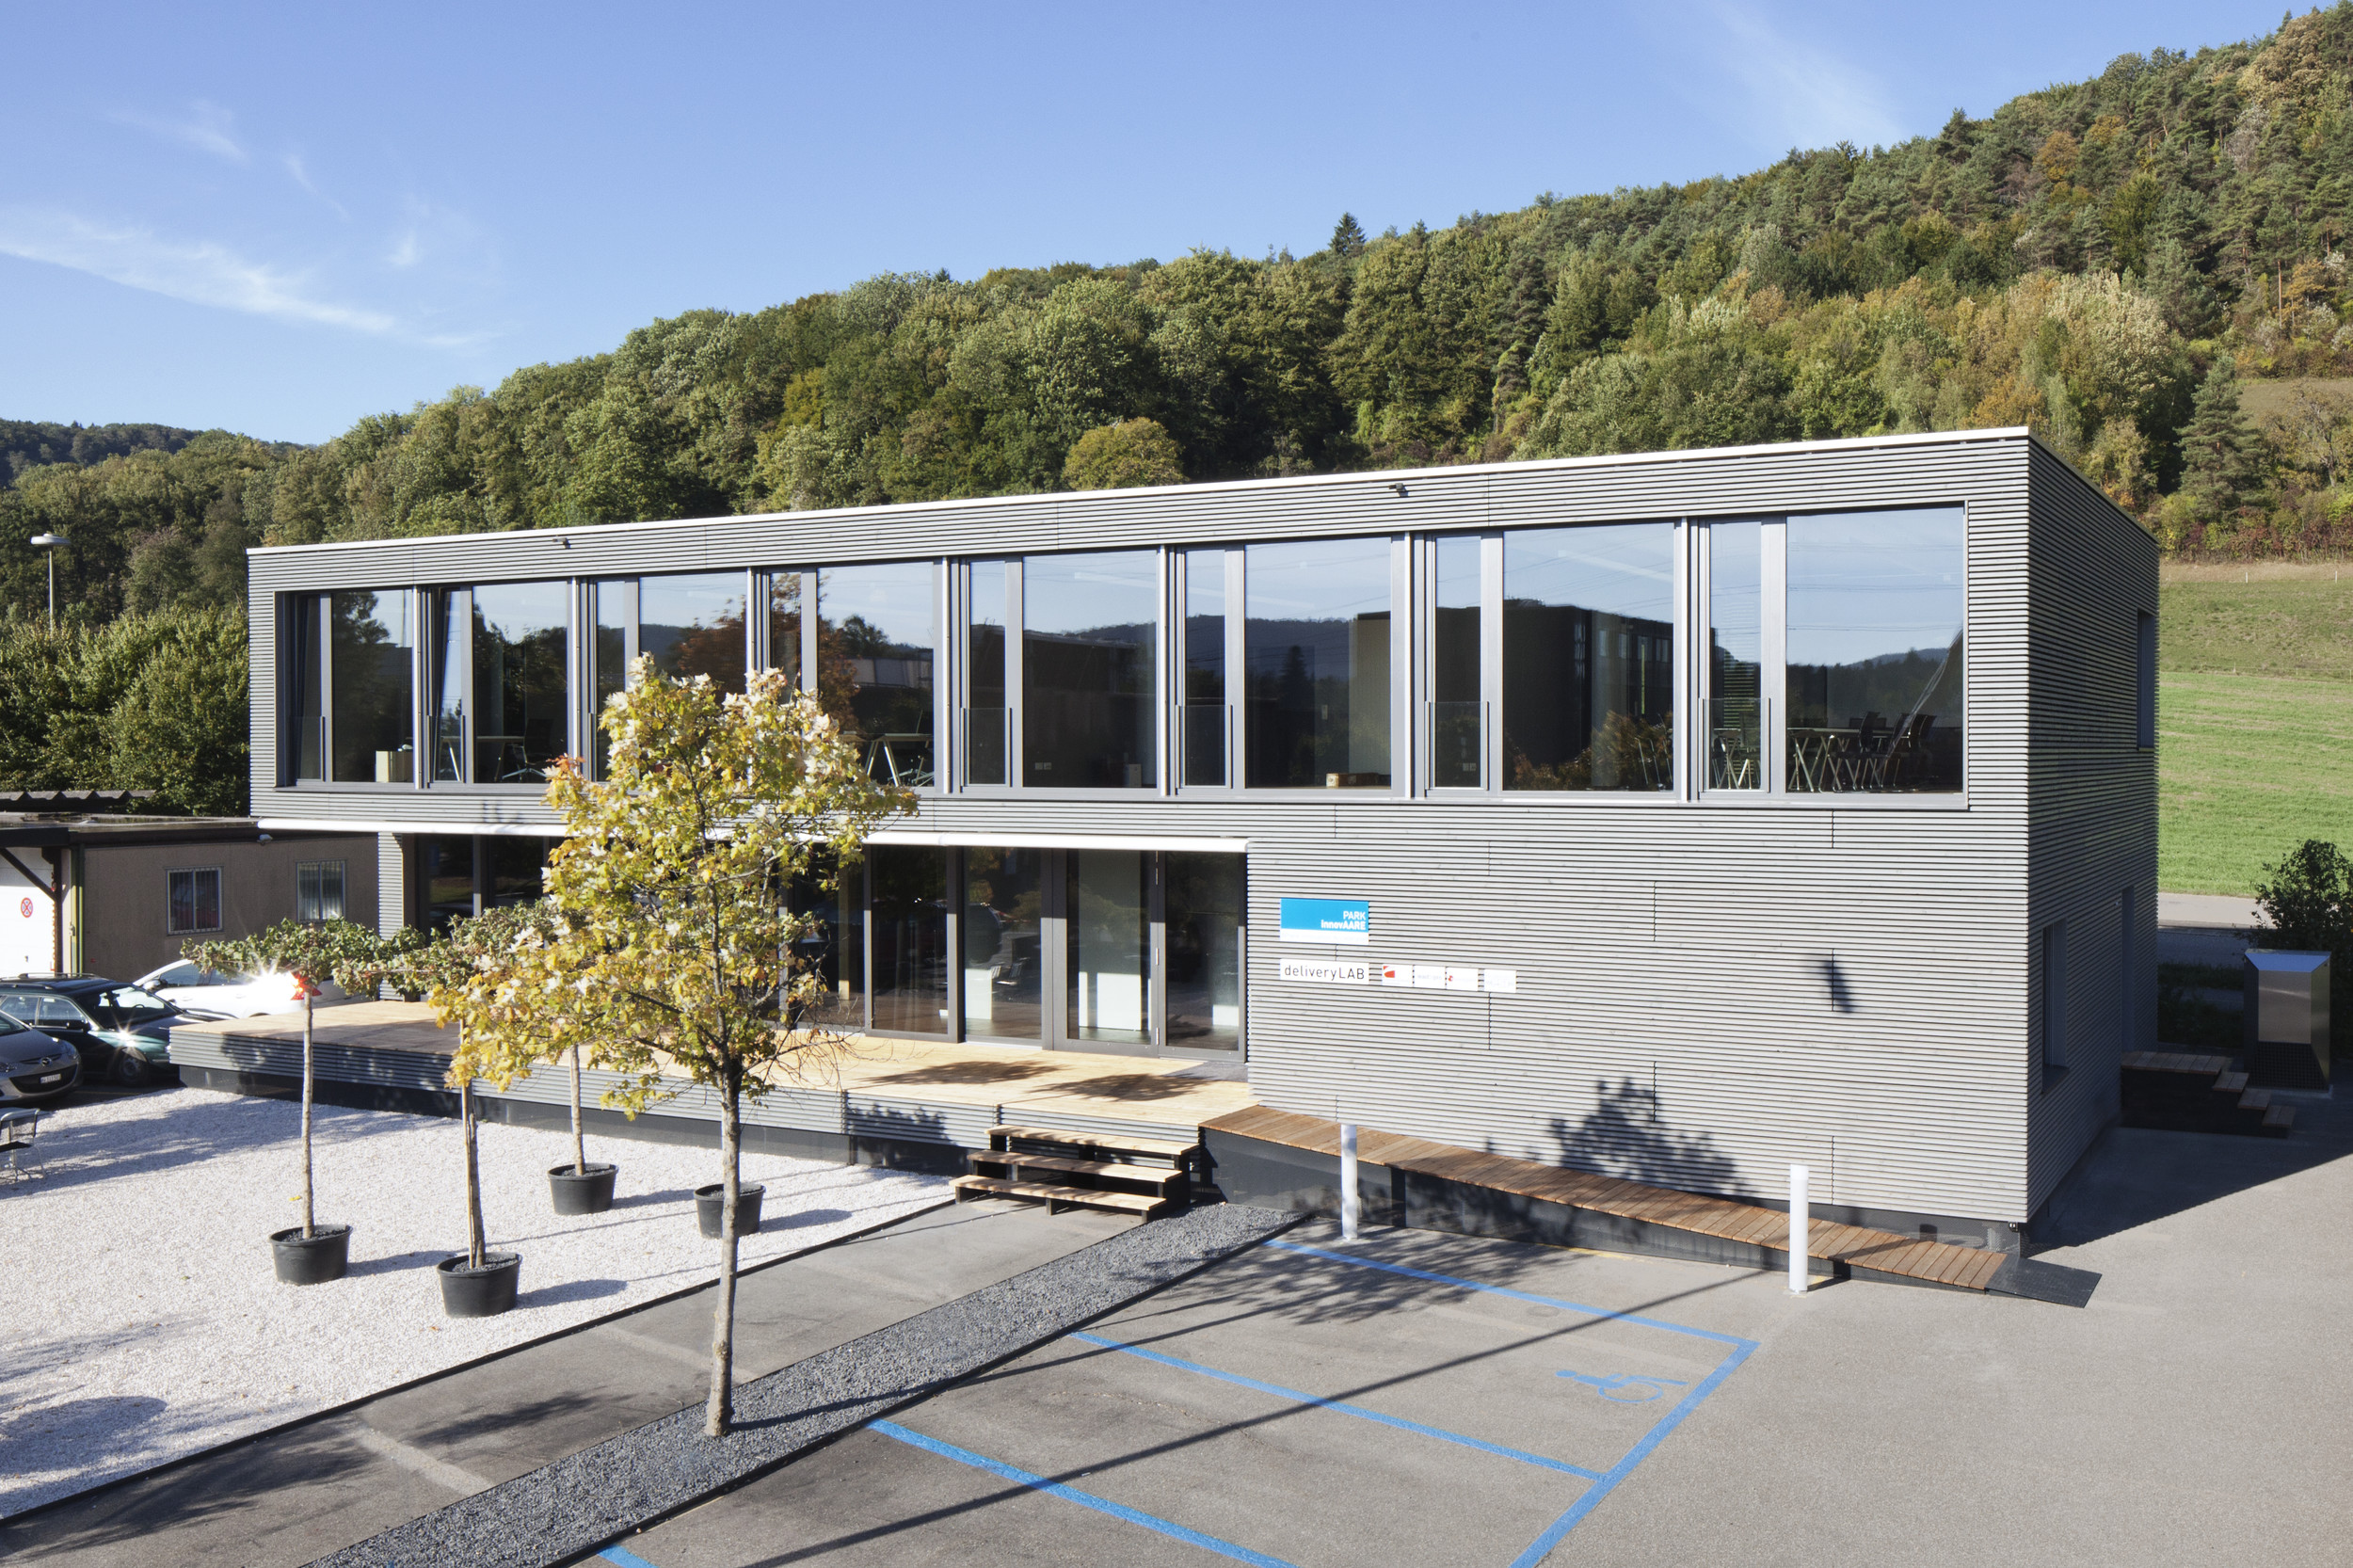 2-geschossiger Infopavillon in Holz-Elementbauweise